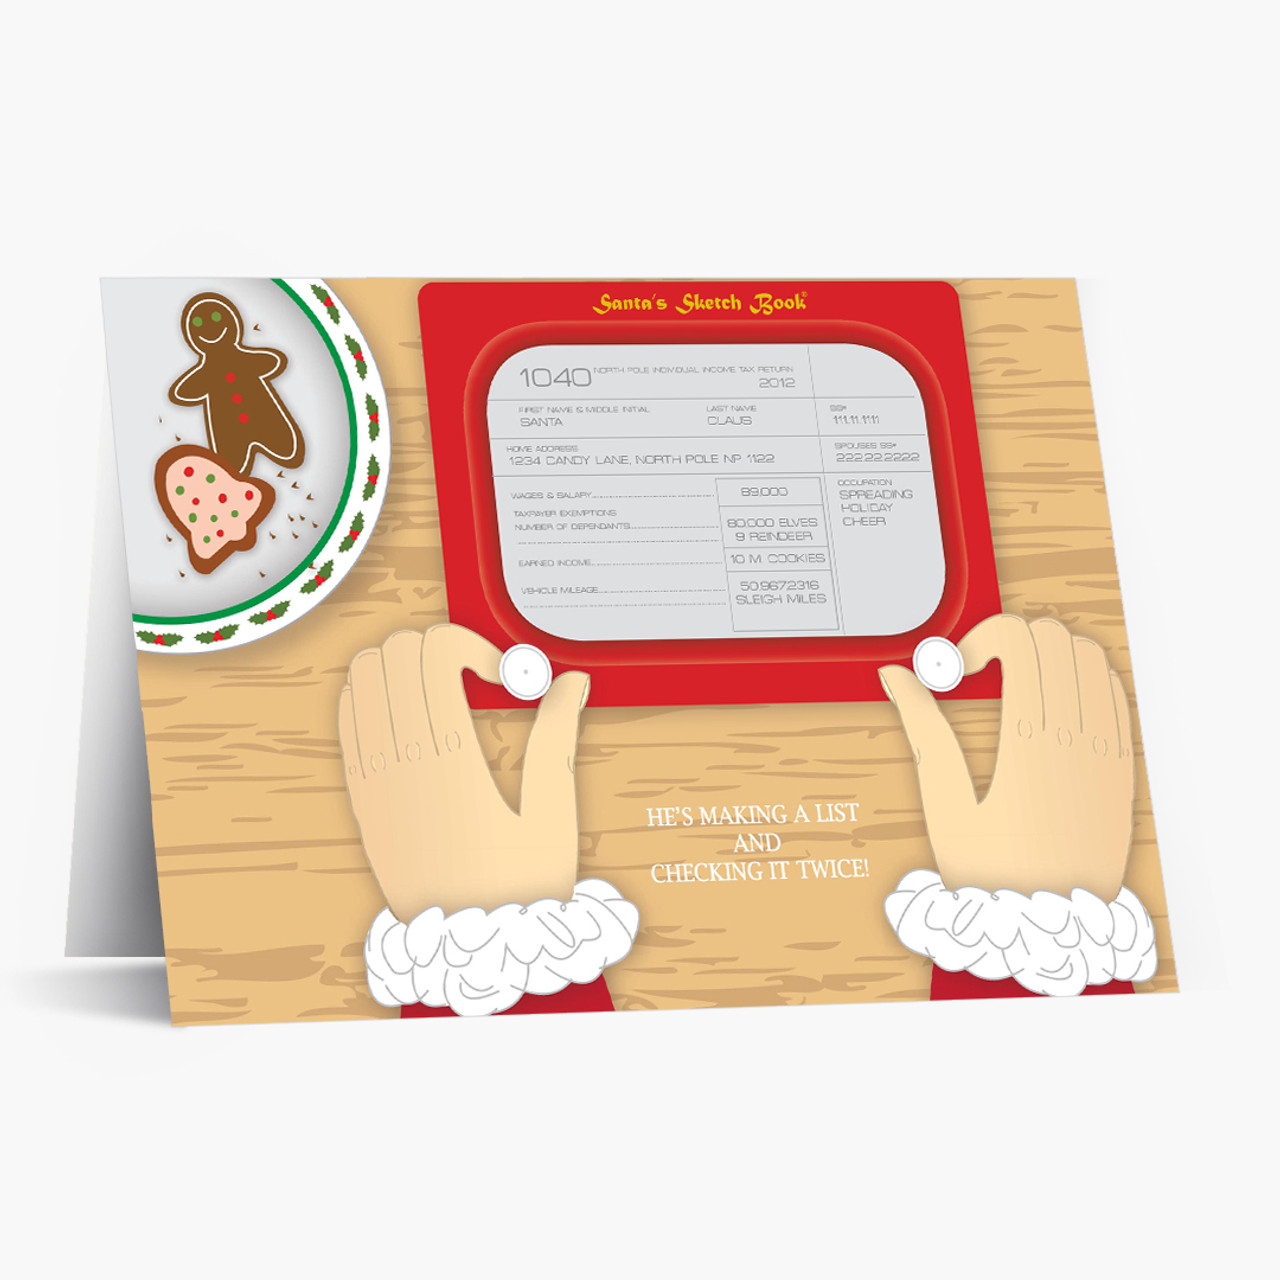 Santa's Sketch Book